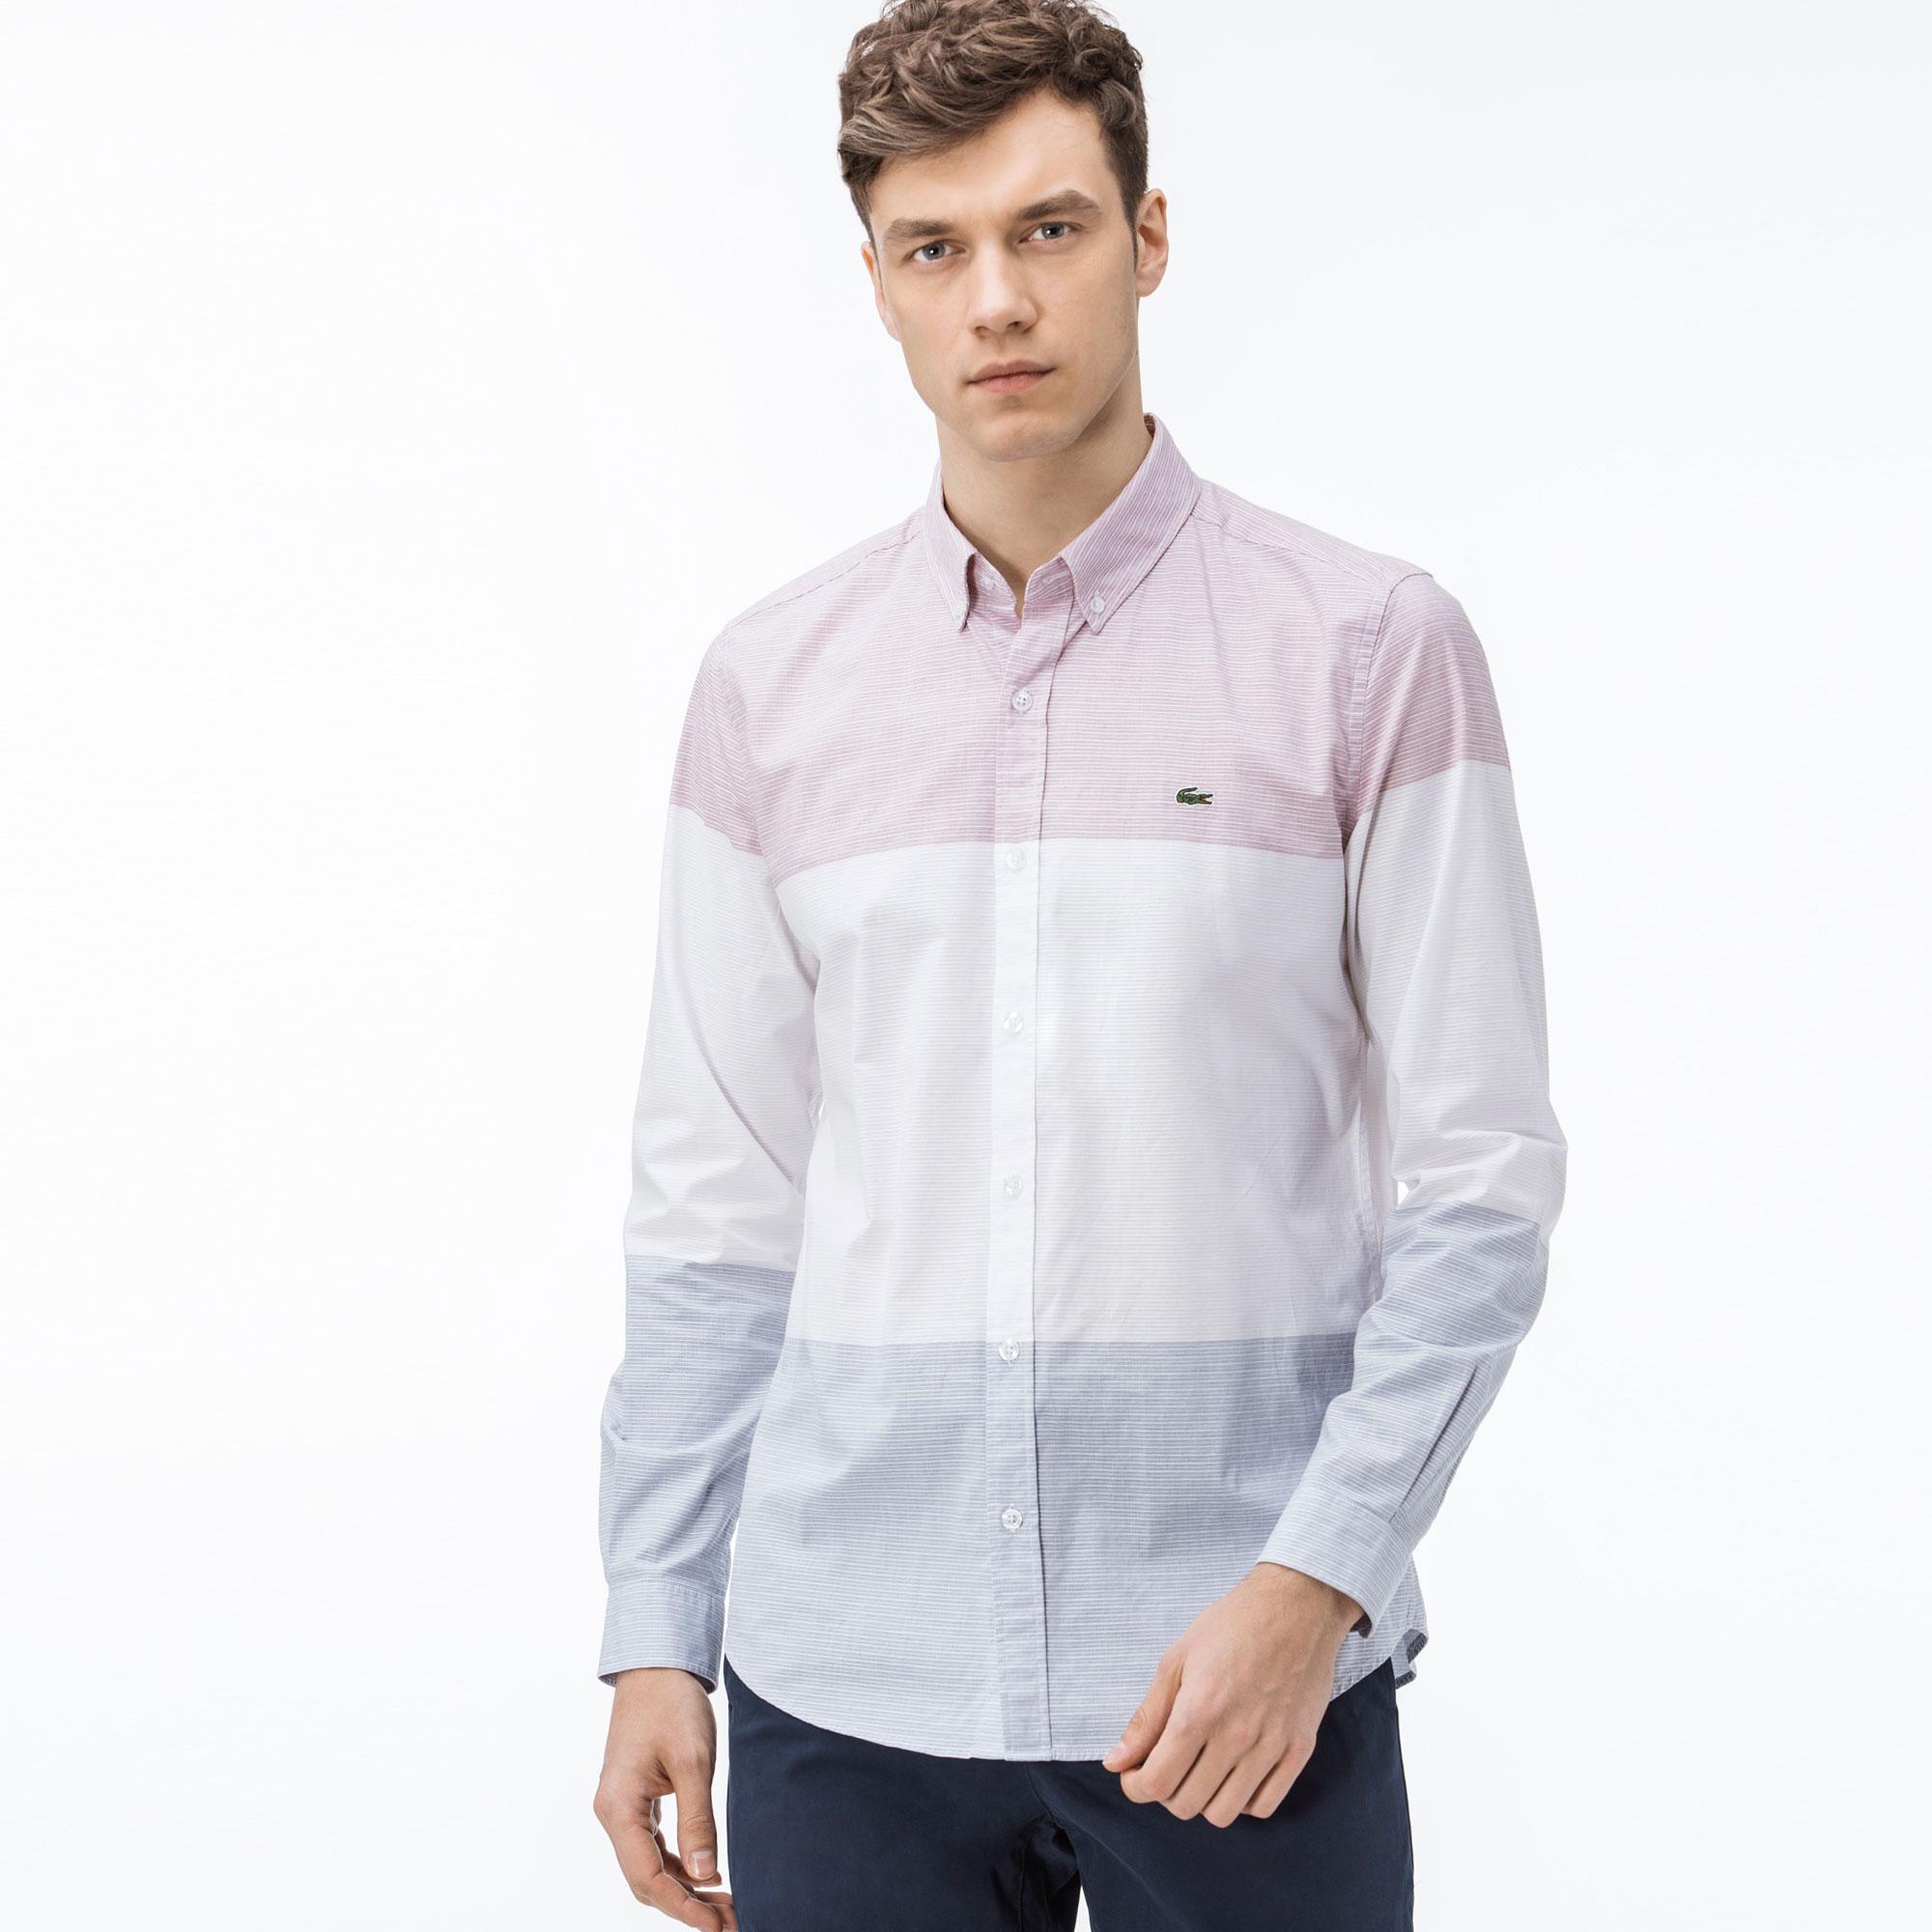 f079791f25d14 Lacoste Erkek Slim Fit Blok Desenli Renkli Gömlek